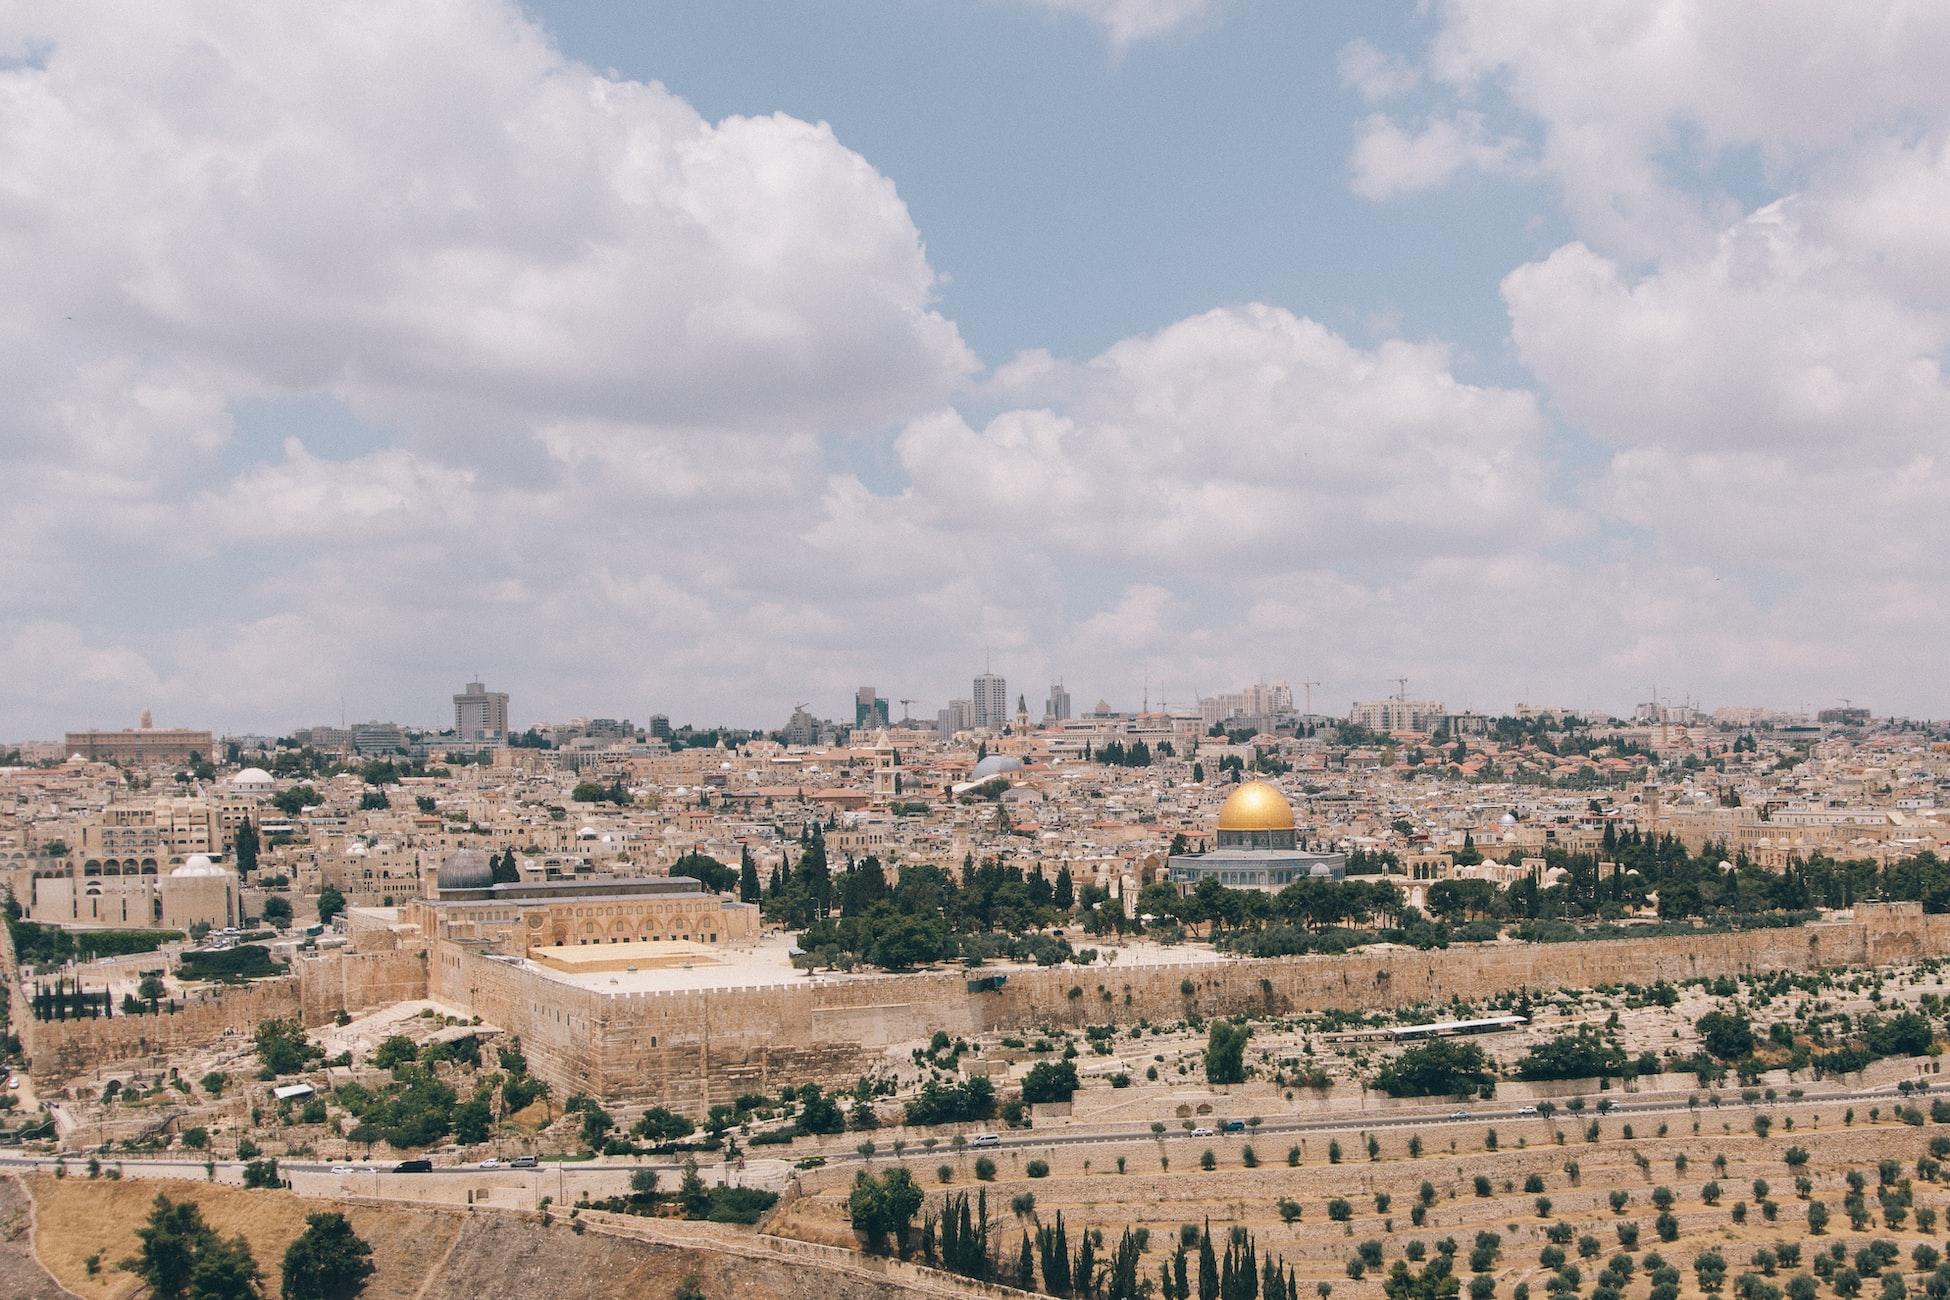 siti UNESCO nel mondo più belli Gerusalemme israele